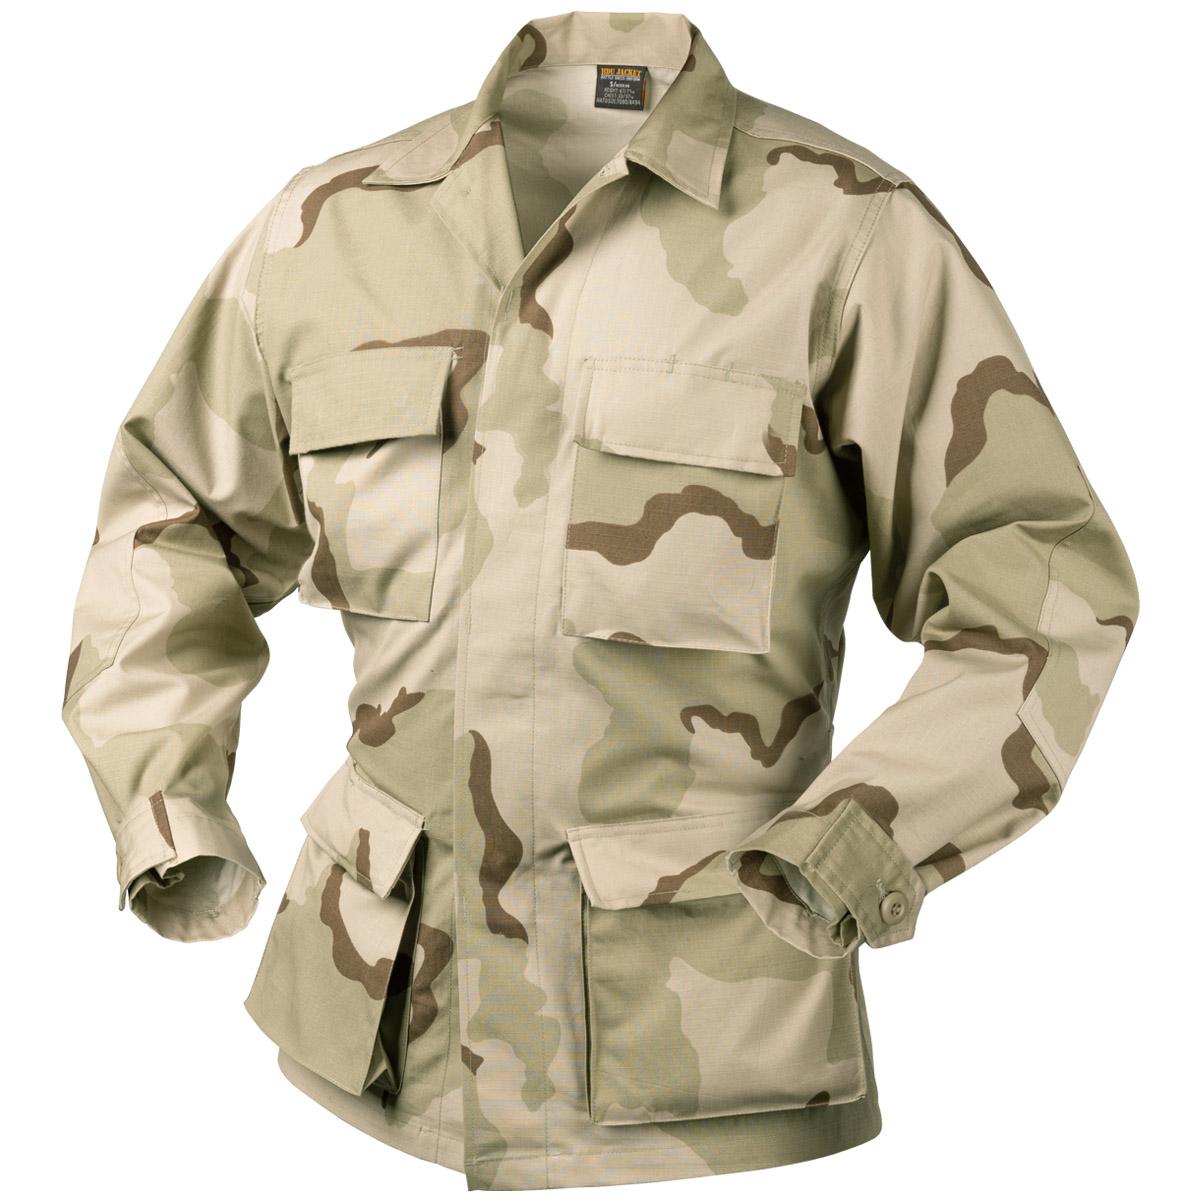 Details about Helikon Genuine BDU Tactical Combat Mens Shirt Army Jacket 3- Colour Desert Camo c4b4726eabef